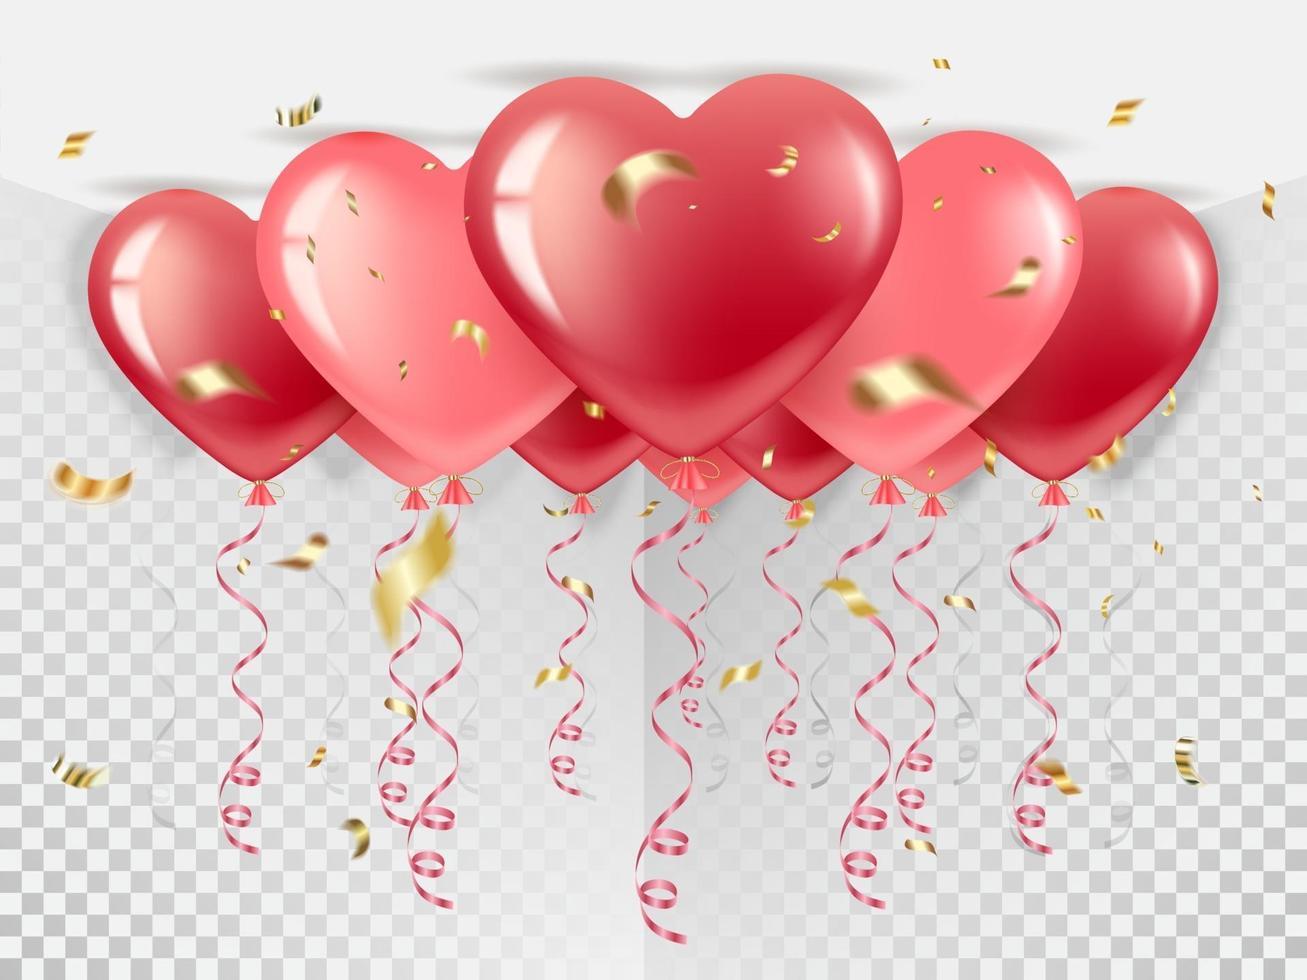 herzförmige Luftballons an der Decke vektor